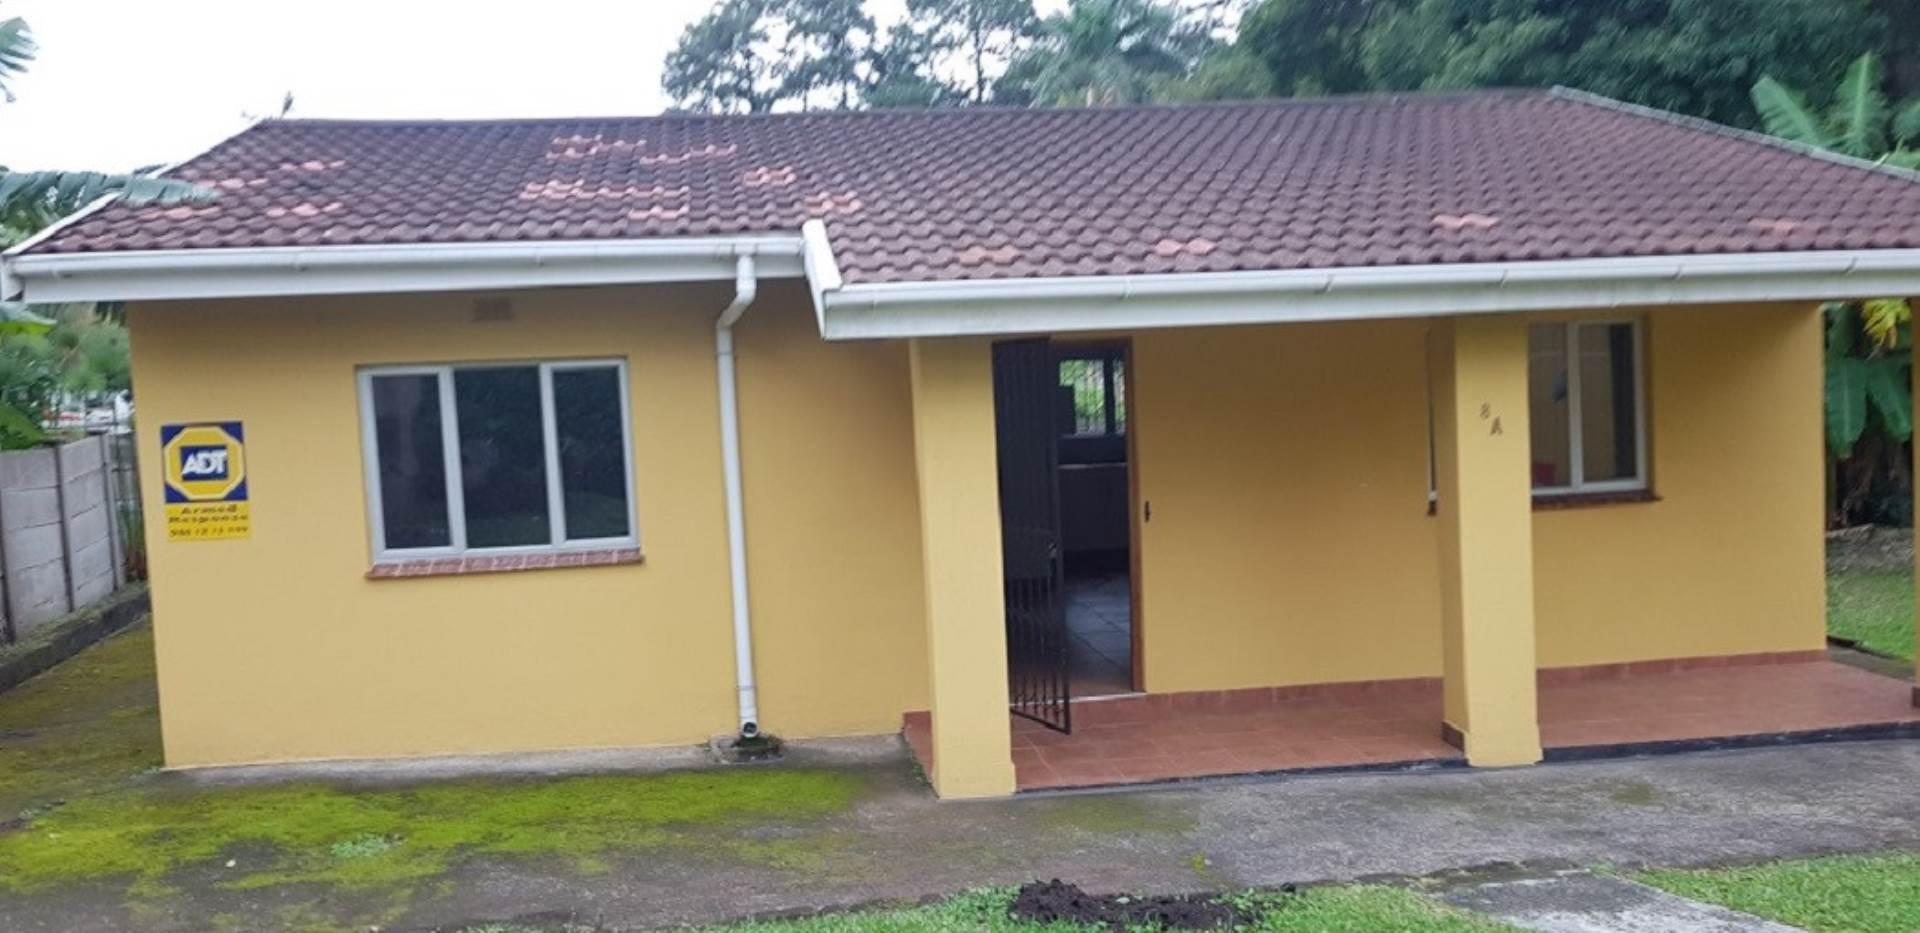 2 BedroomTownhouse To Rent In Escombe